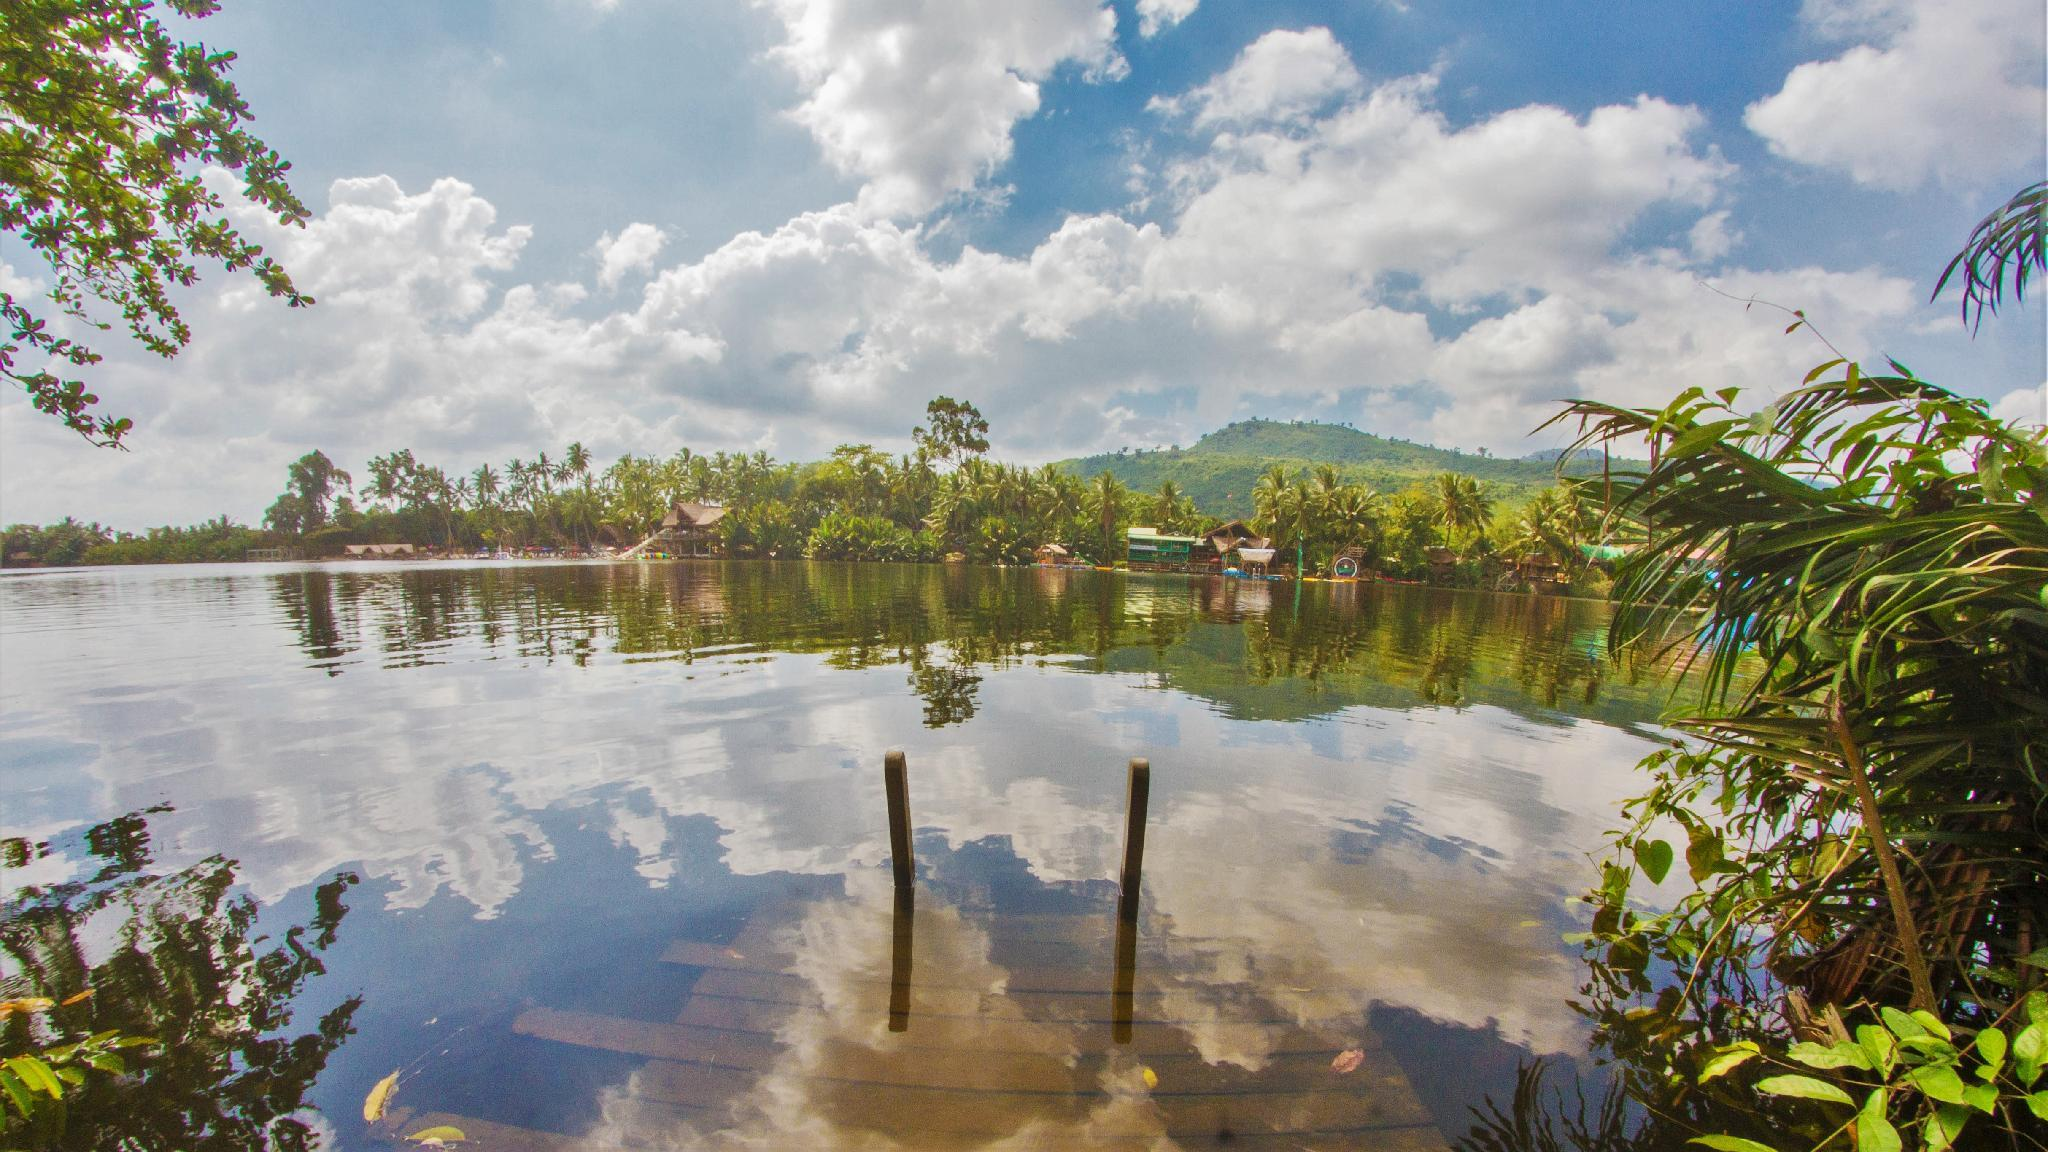 Peam Snea Resort